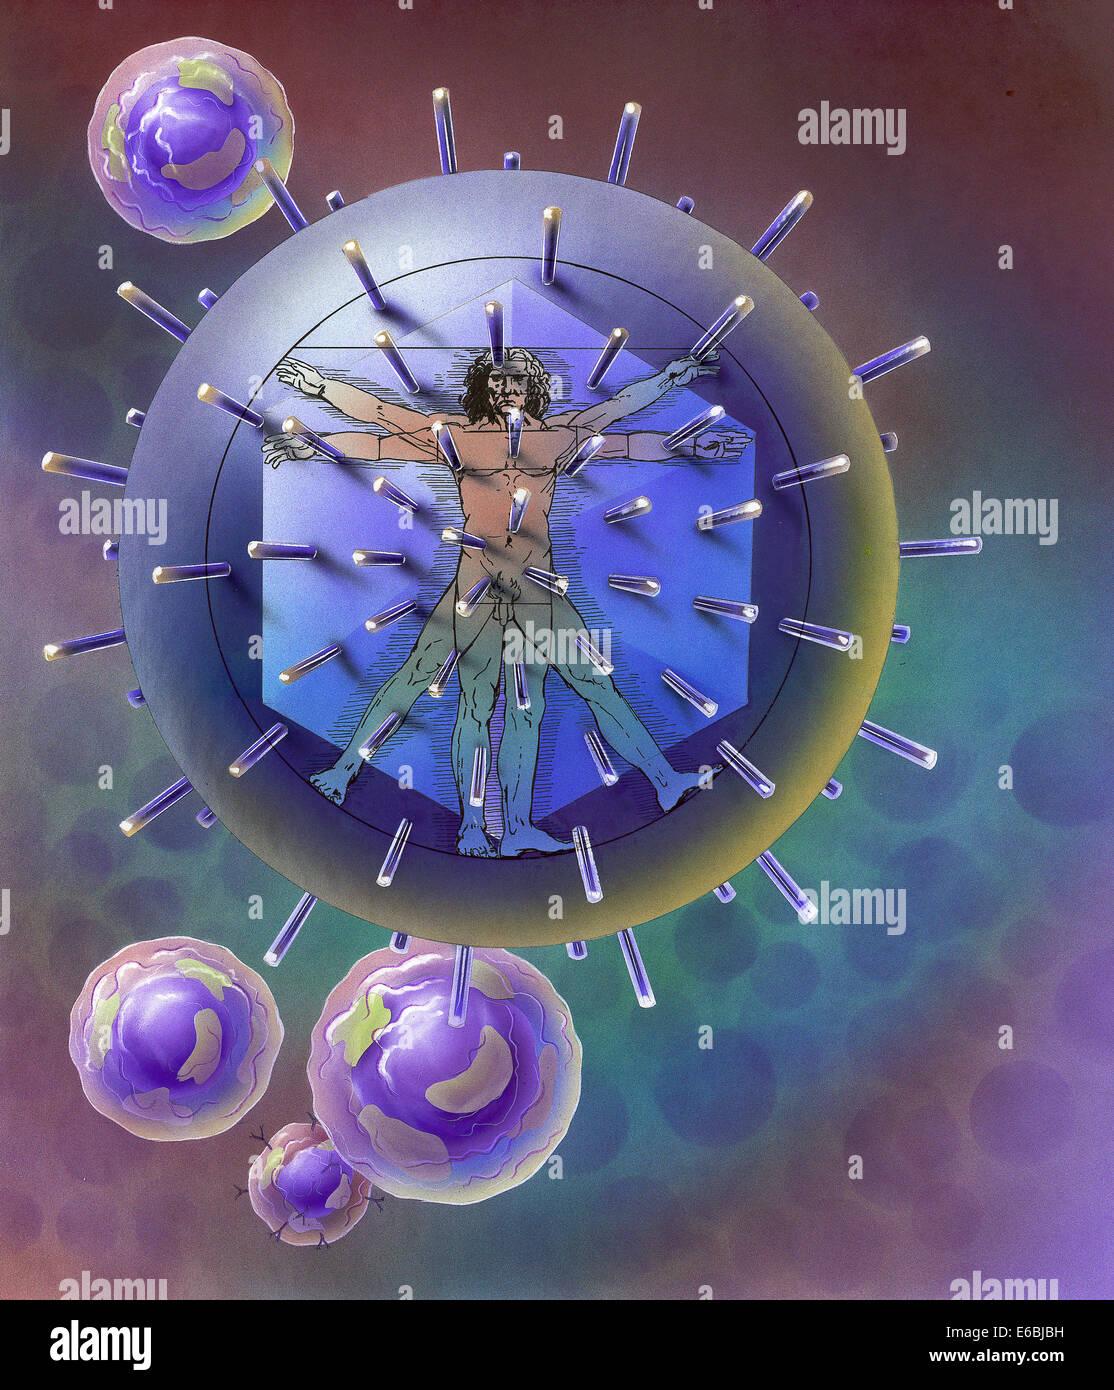 Vitruvian Man inside virus particle. - Stock Image